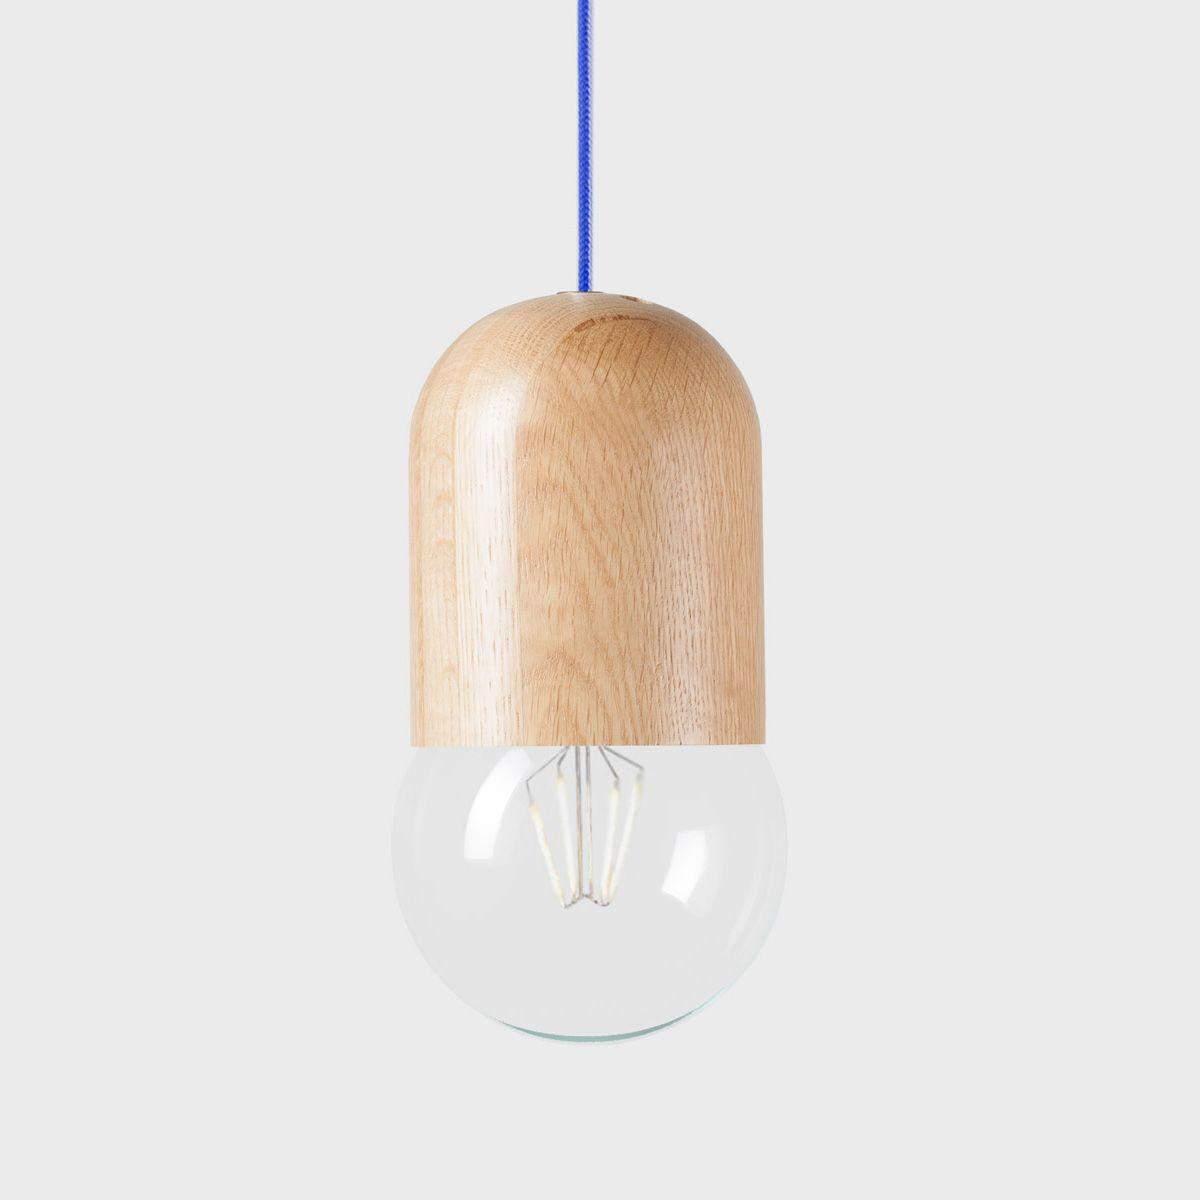 Подвесной светильник Light Bean Bubble со тёмно-синим проводомПодвесные светильники<br><br>